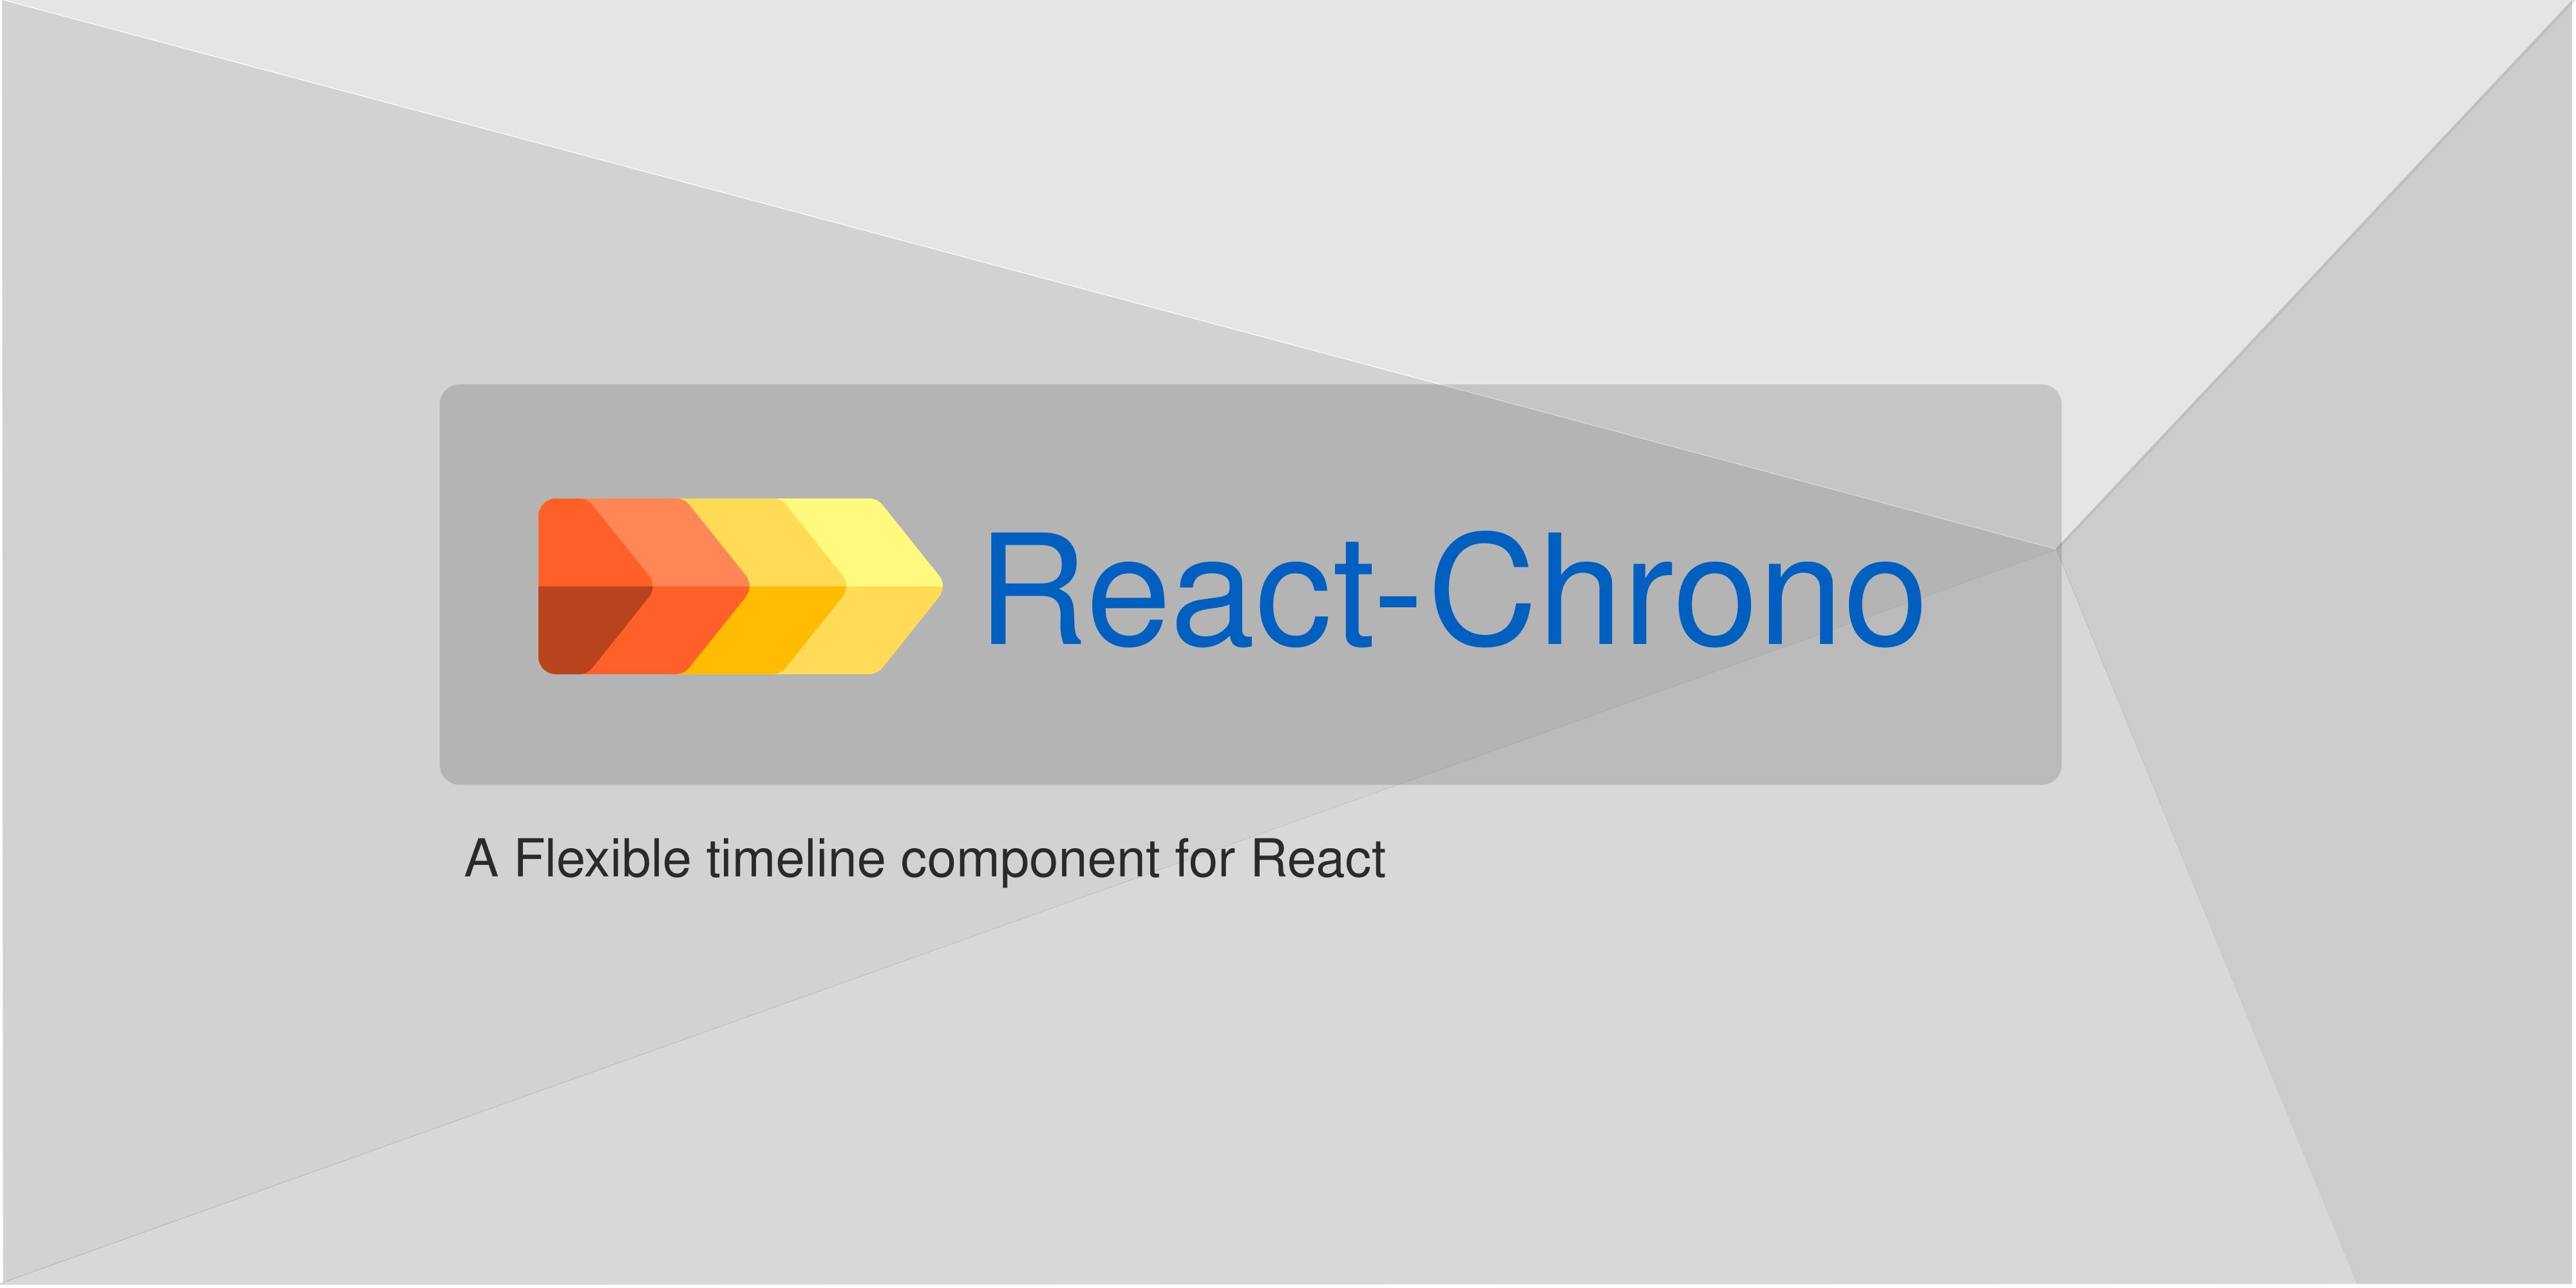 react-chrono